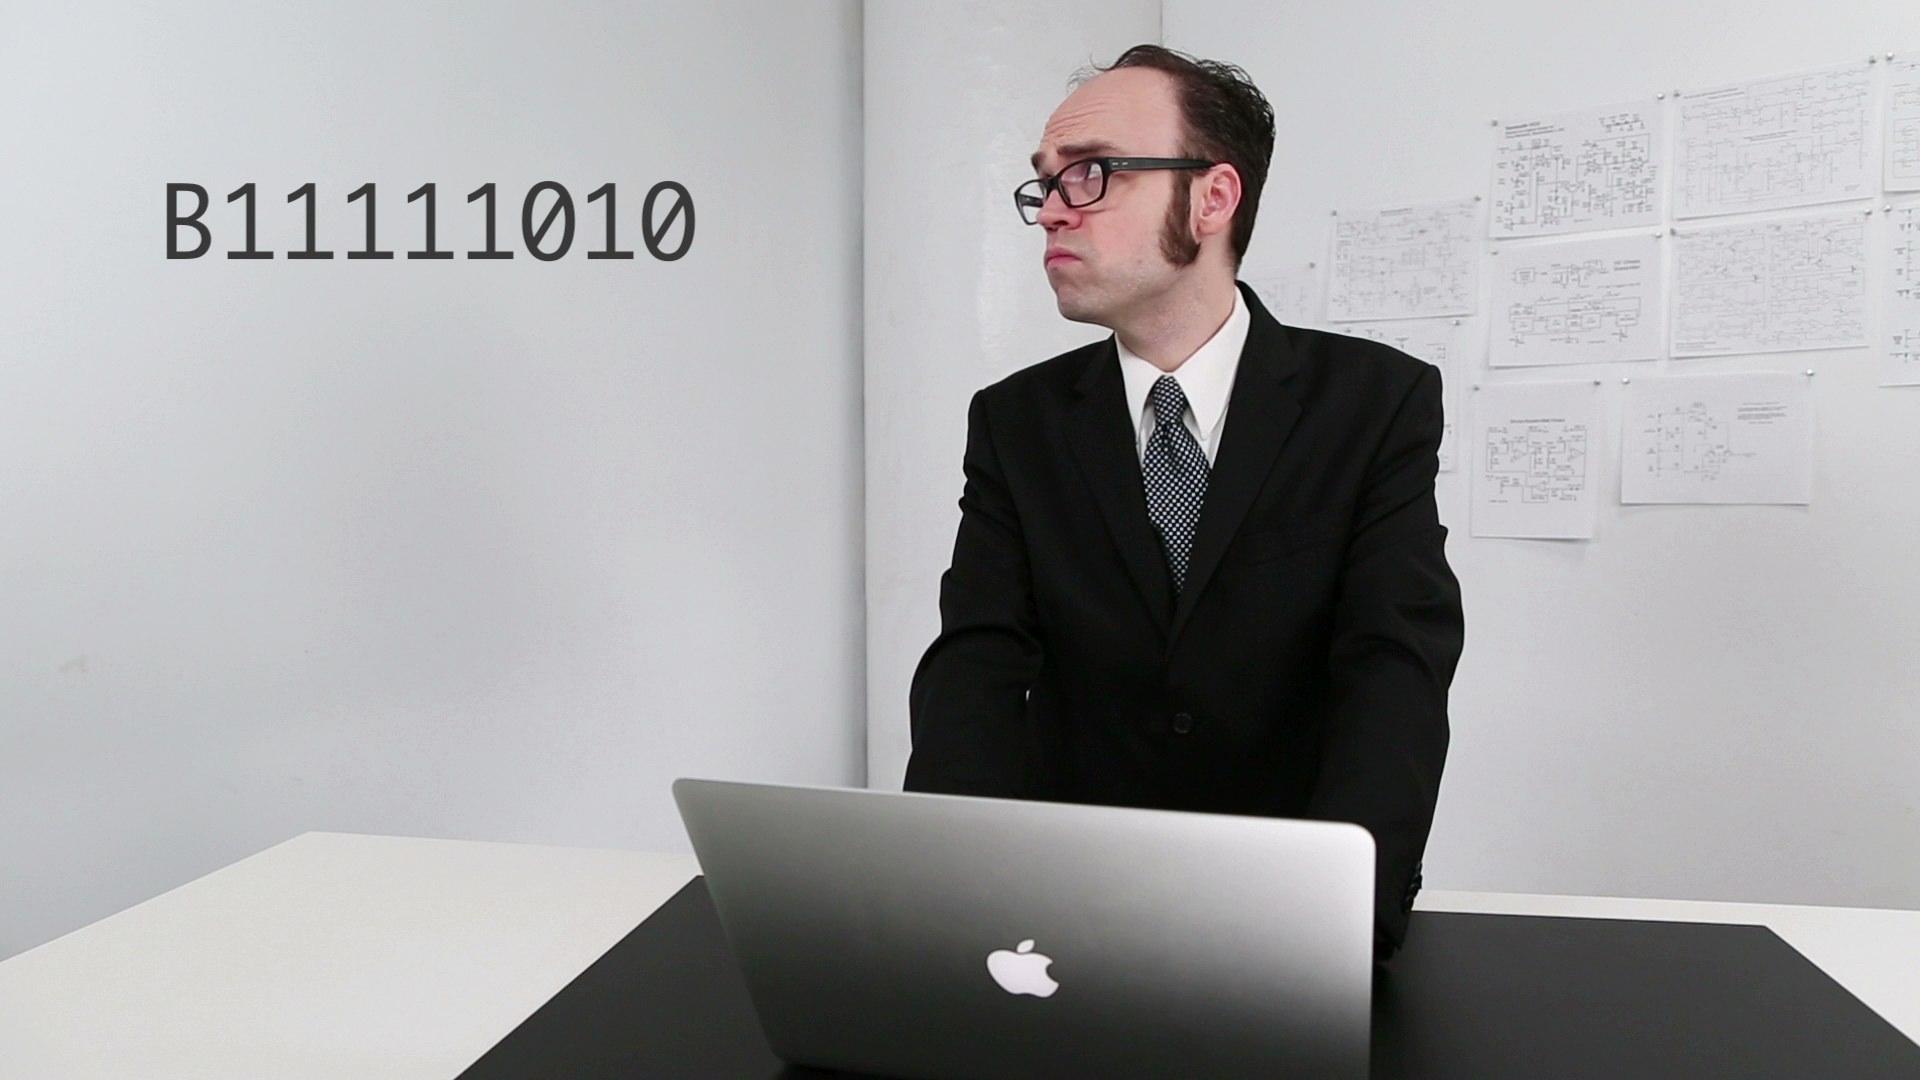 collin_s_lab_Collins_Lab-Binary_and_Hex-v2-6.jpeg